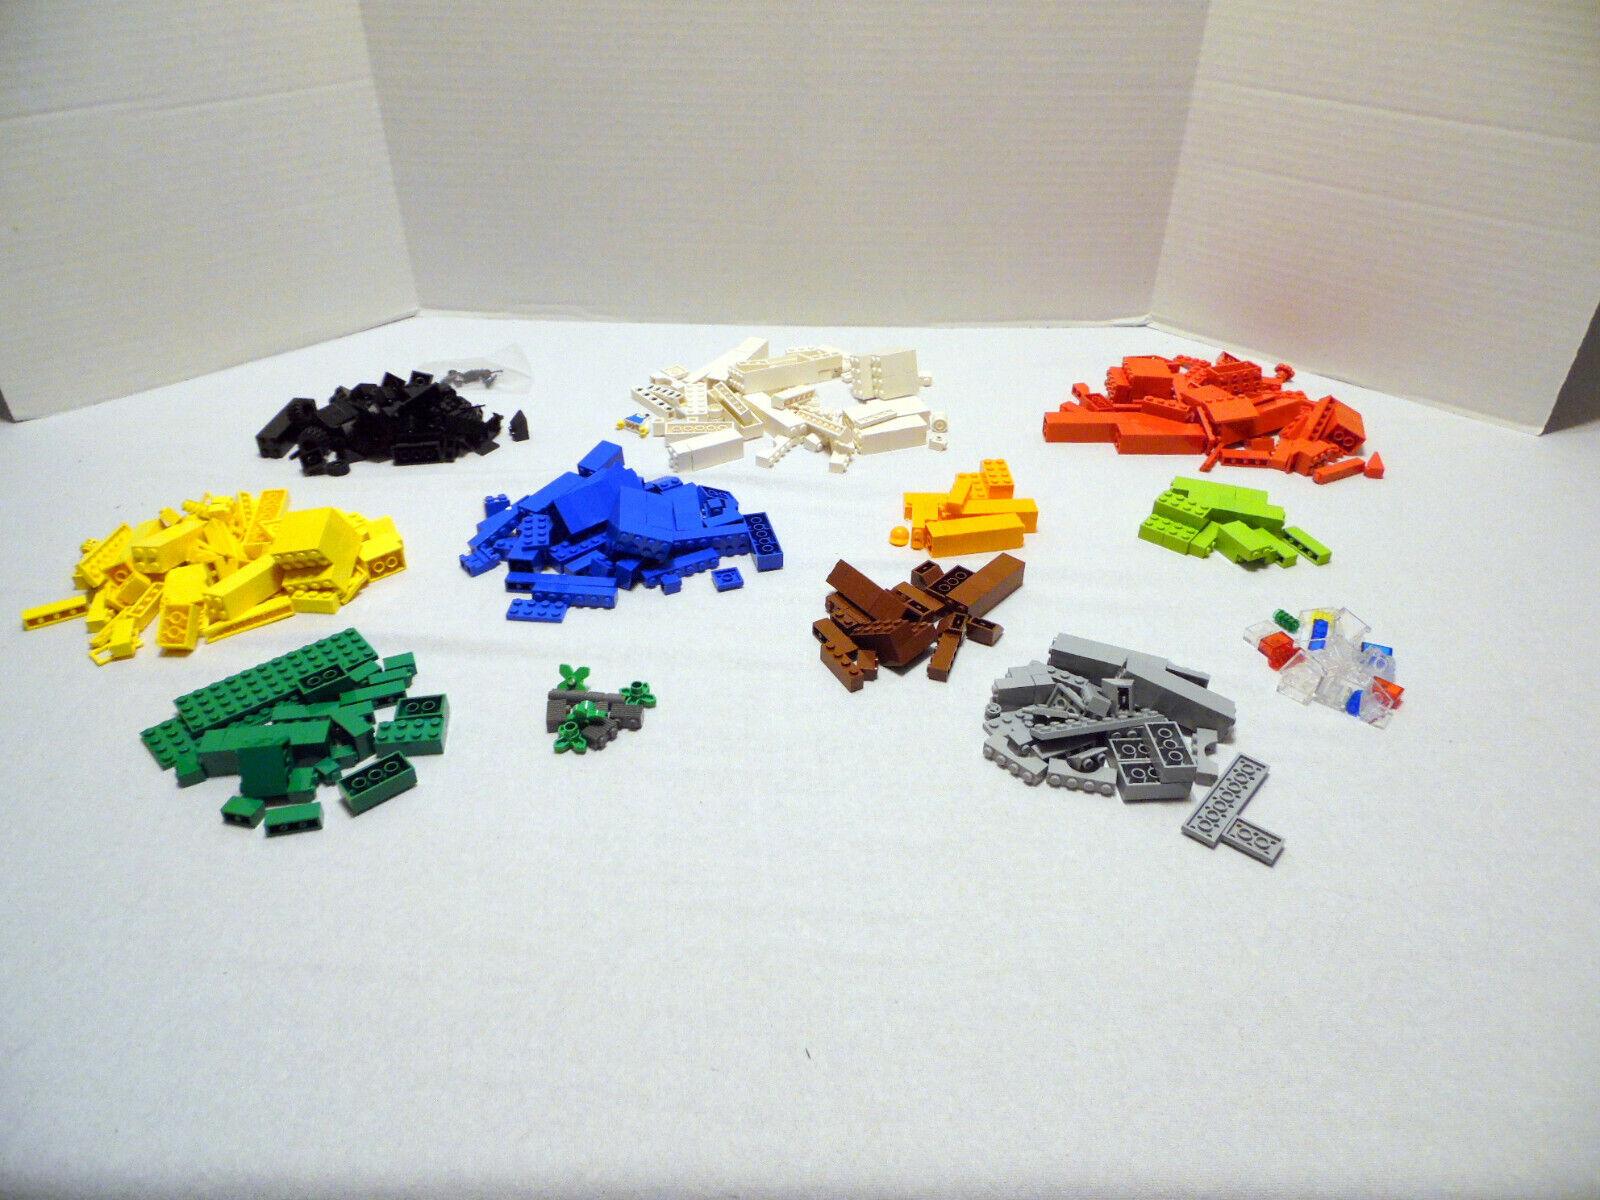 Lego 6131 Build  and Play - 2011 - 100% Build Complete  sortie en ligne